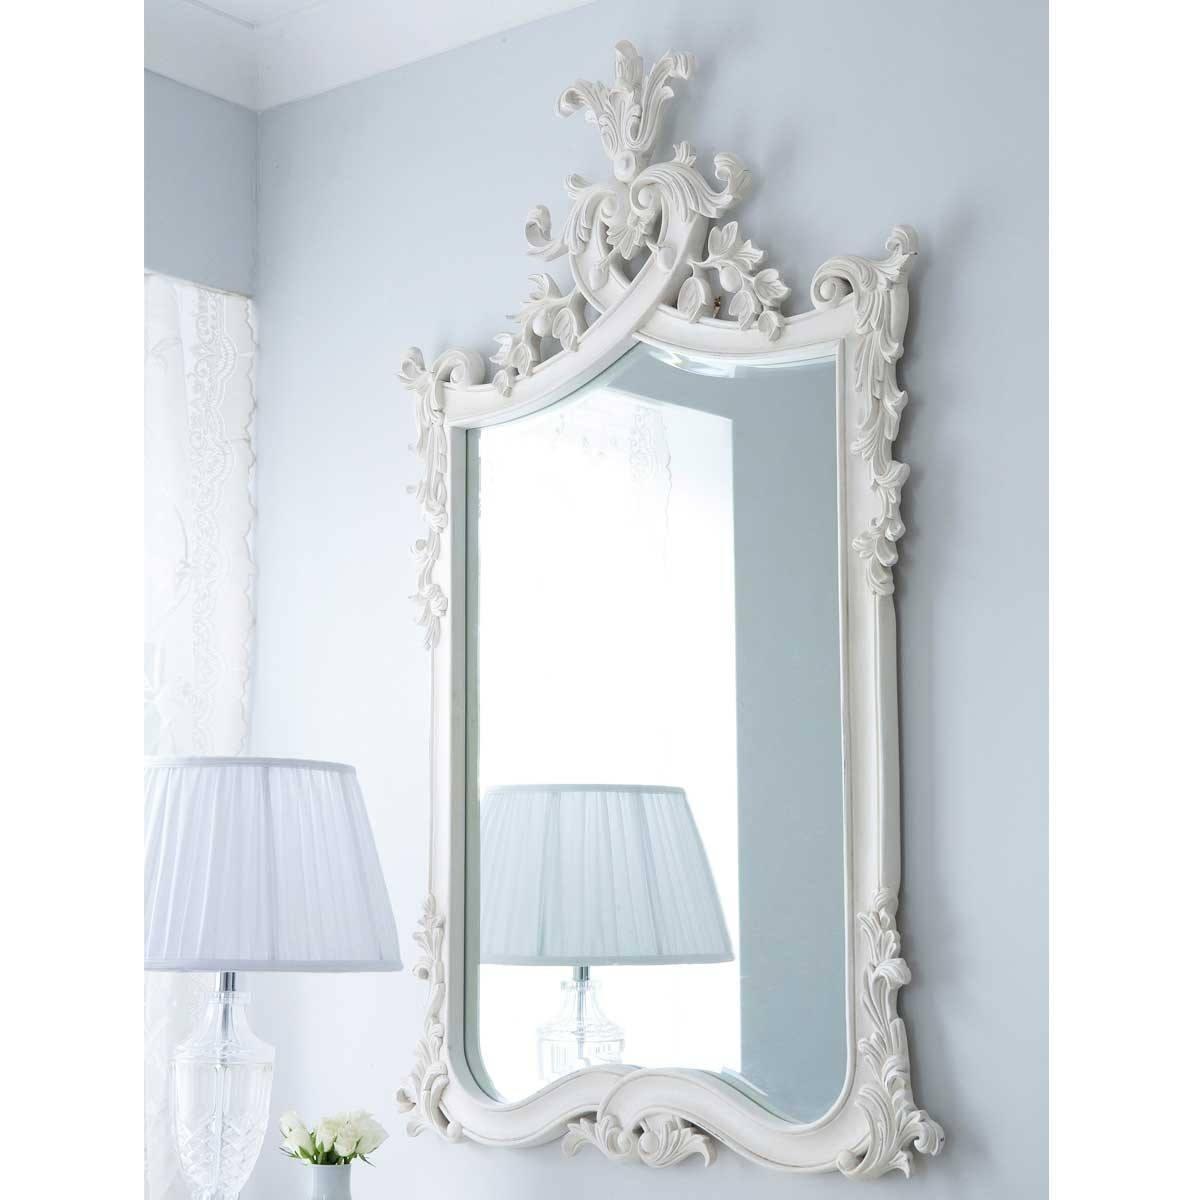 Provencal Heart Top White Mirror | Luxury Mirror In White French Mirror (View 3 of 20)